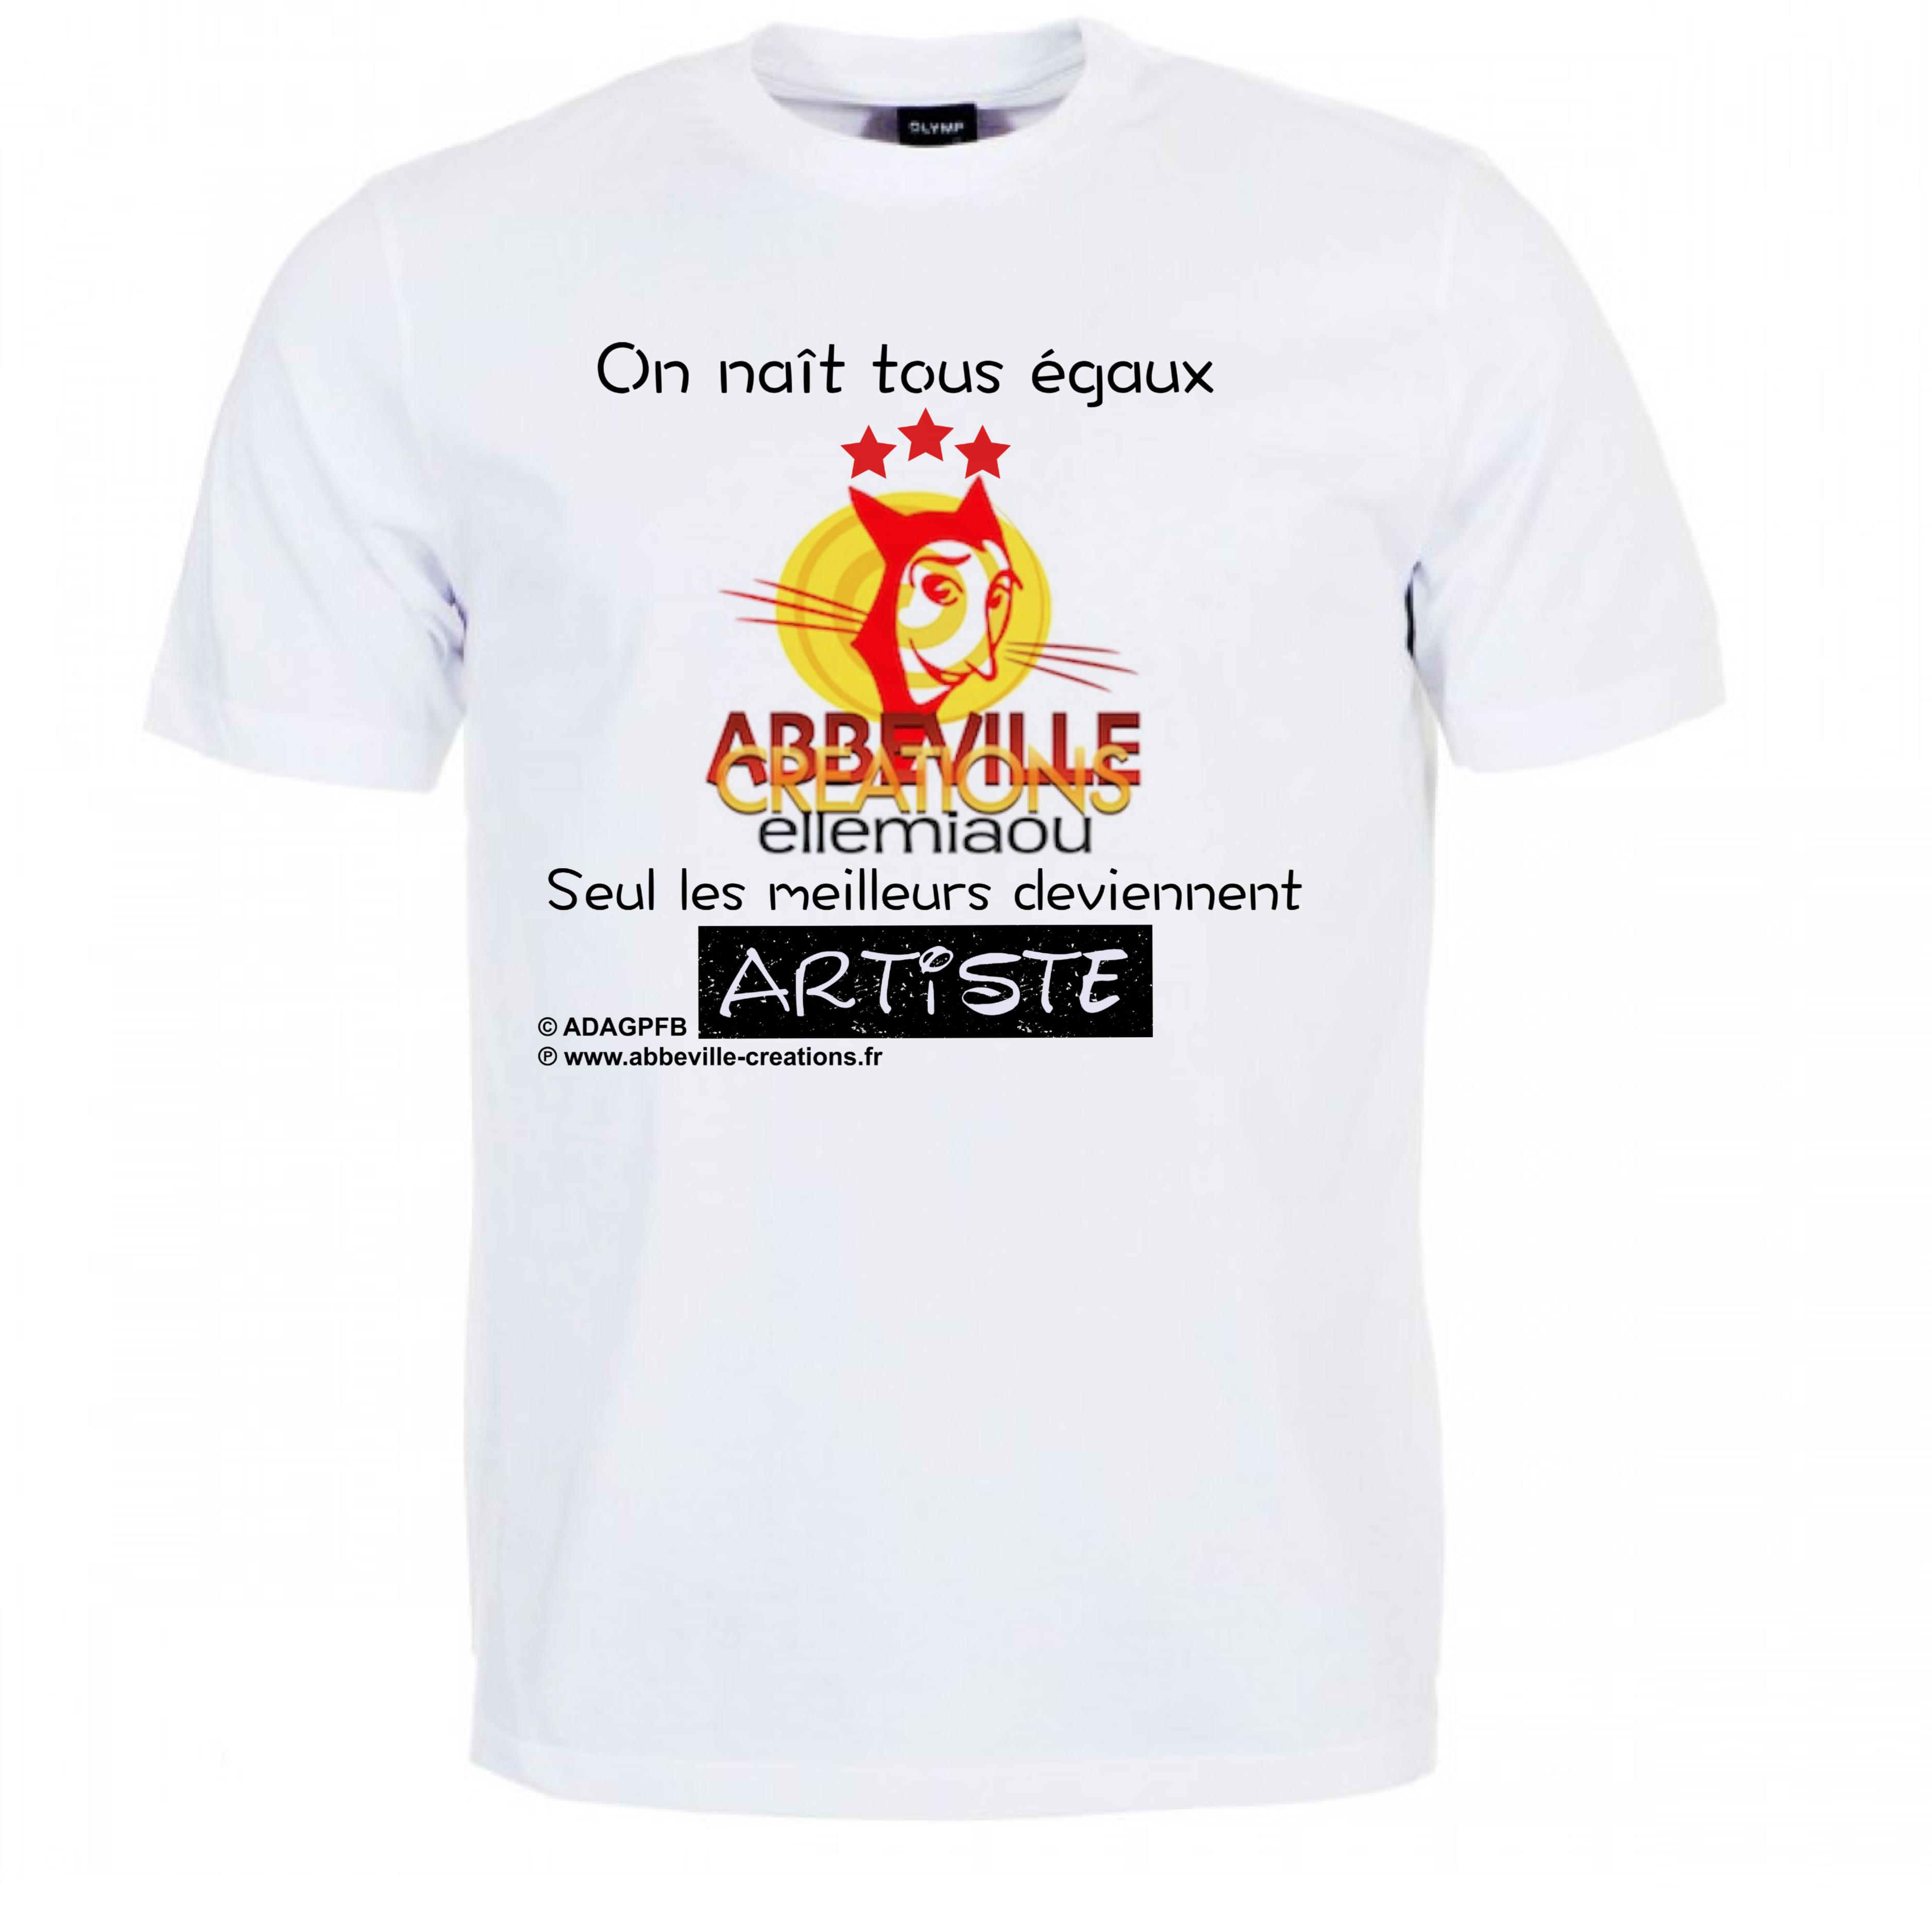 Tshirt1a-1509464193.jpeg